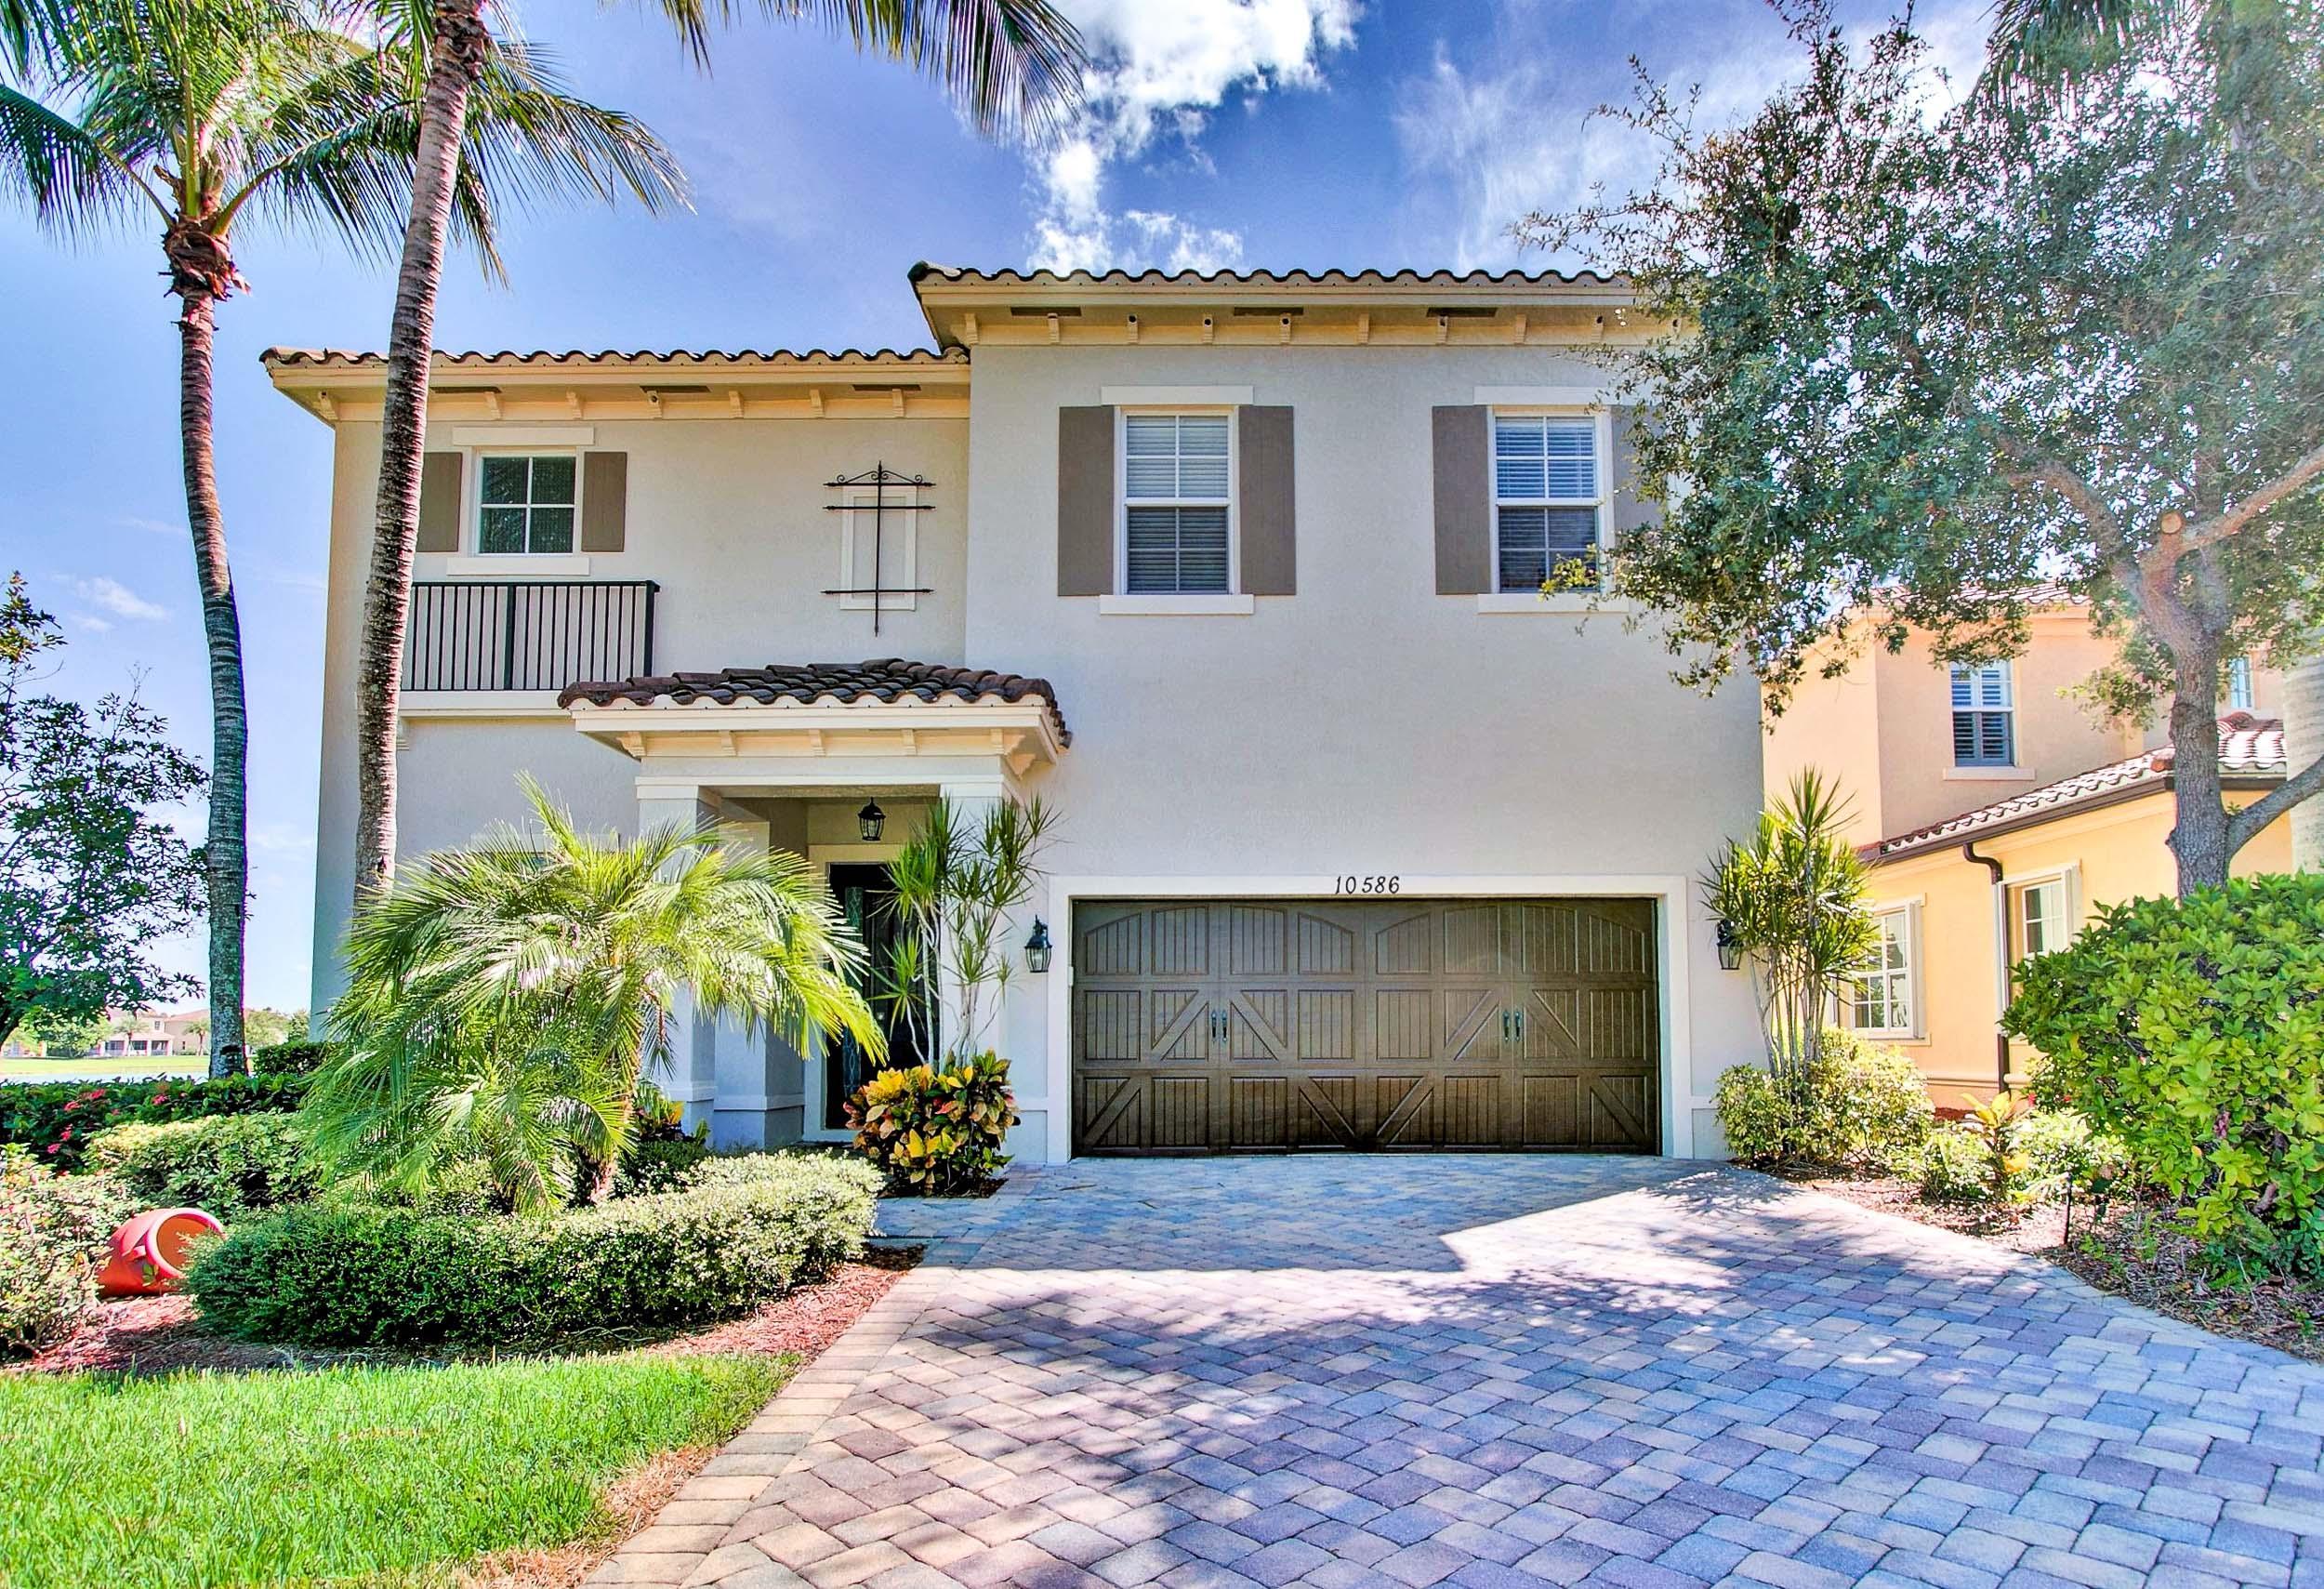 10586 Willow Oak Court, Wellington, Florida 33414, 5 Bedrooms Bedrooms, ,3.1 BathroomsBathrooms,Single Family,For Rent,Willow Oak,RX-10550143